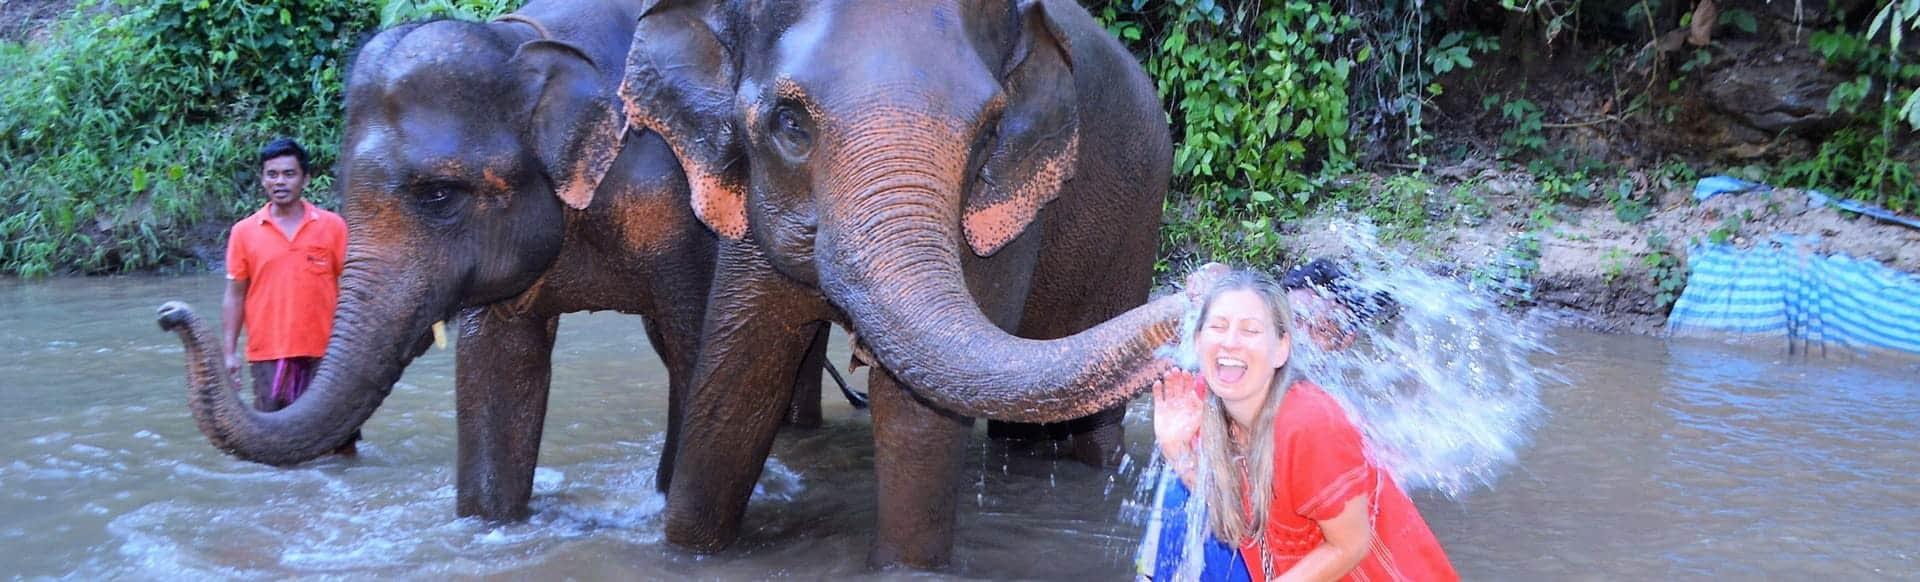 toto elephant hug chiang mai